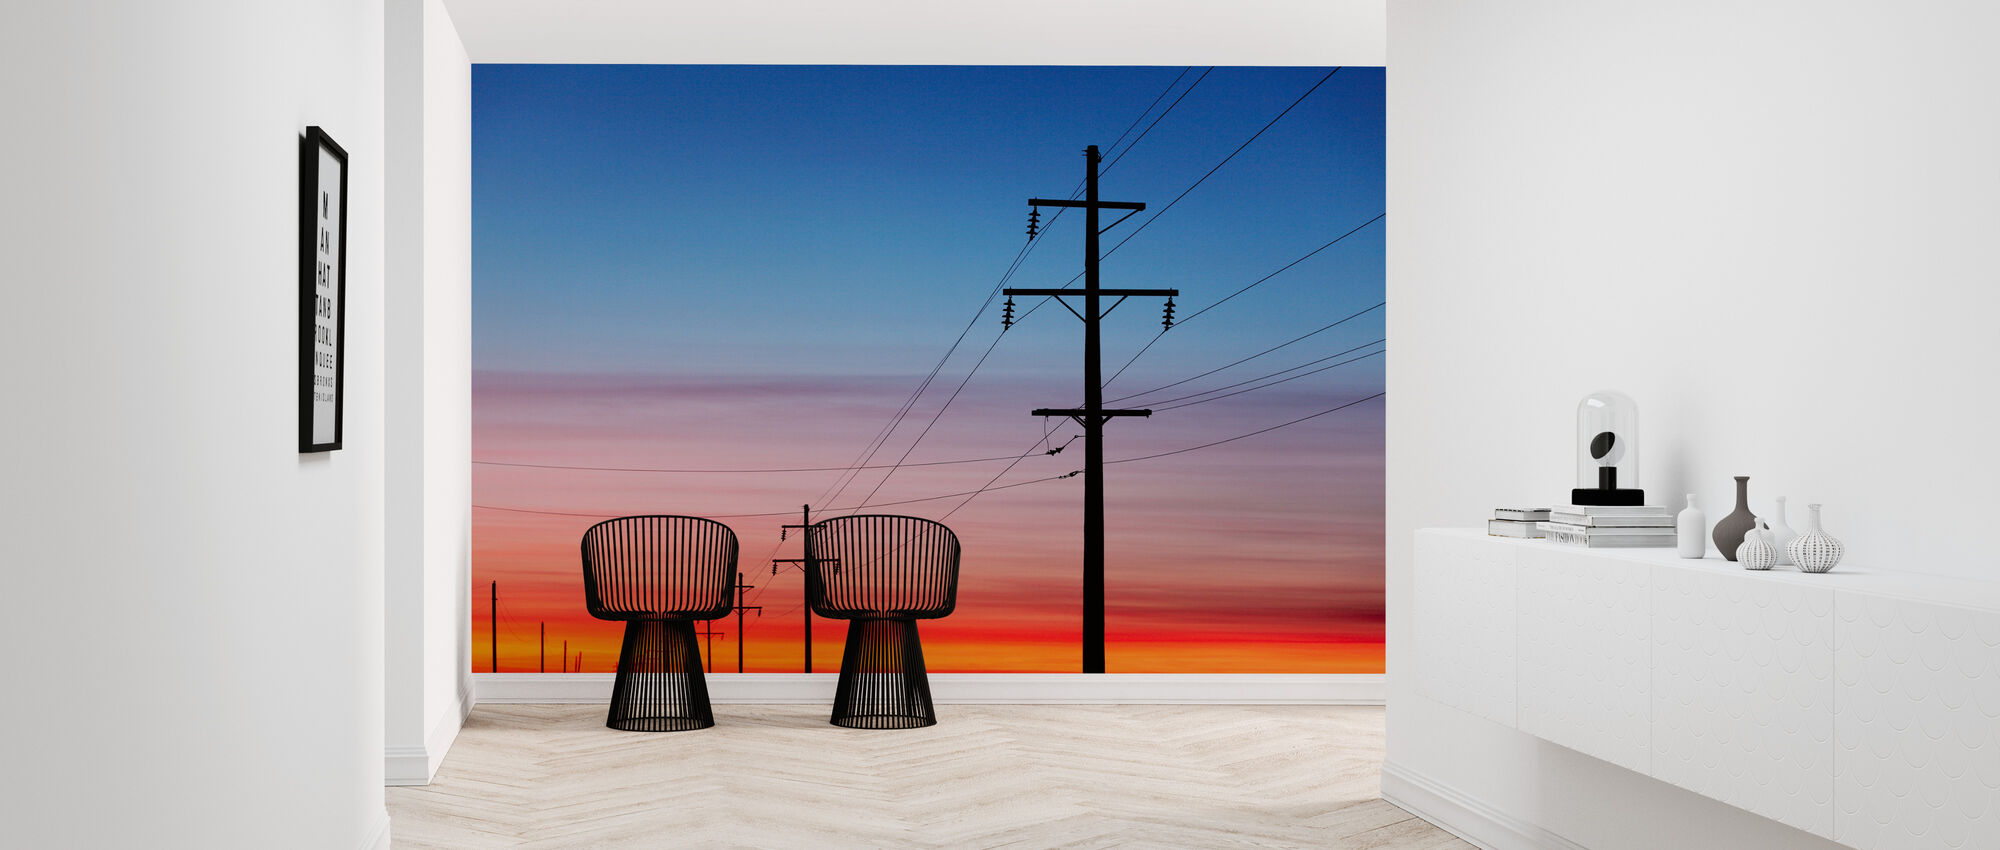 Power Lines at Sunset - Wallpaper - Hallway